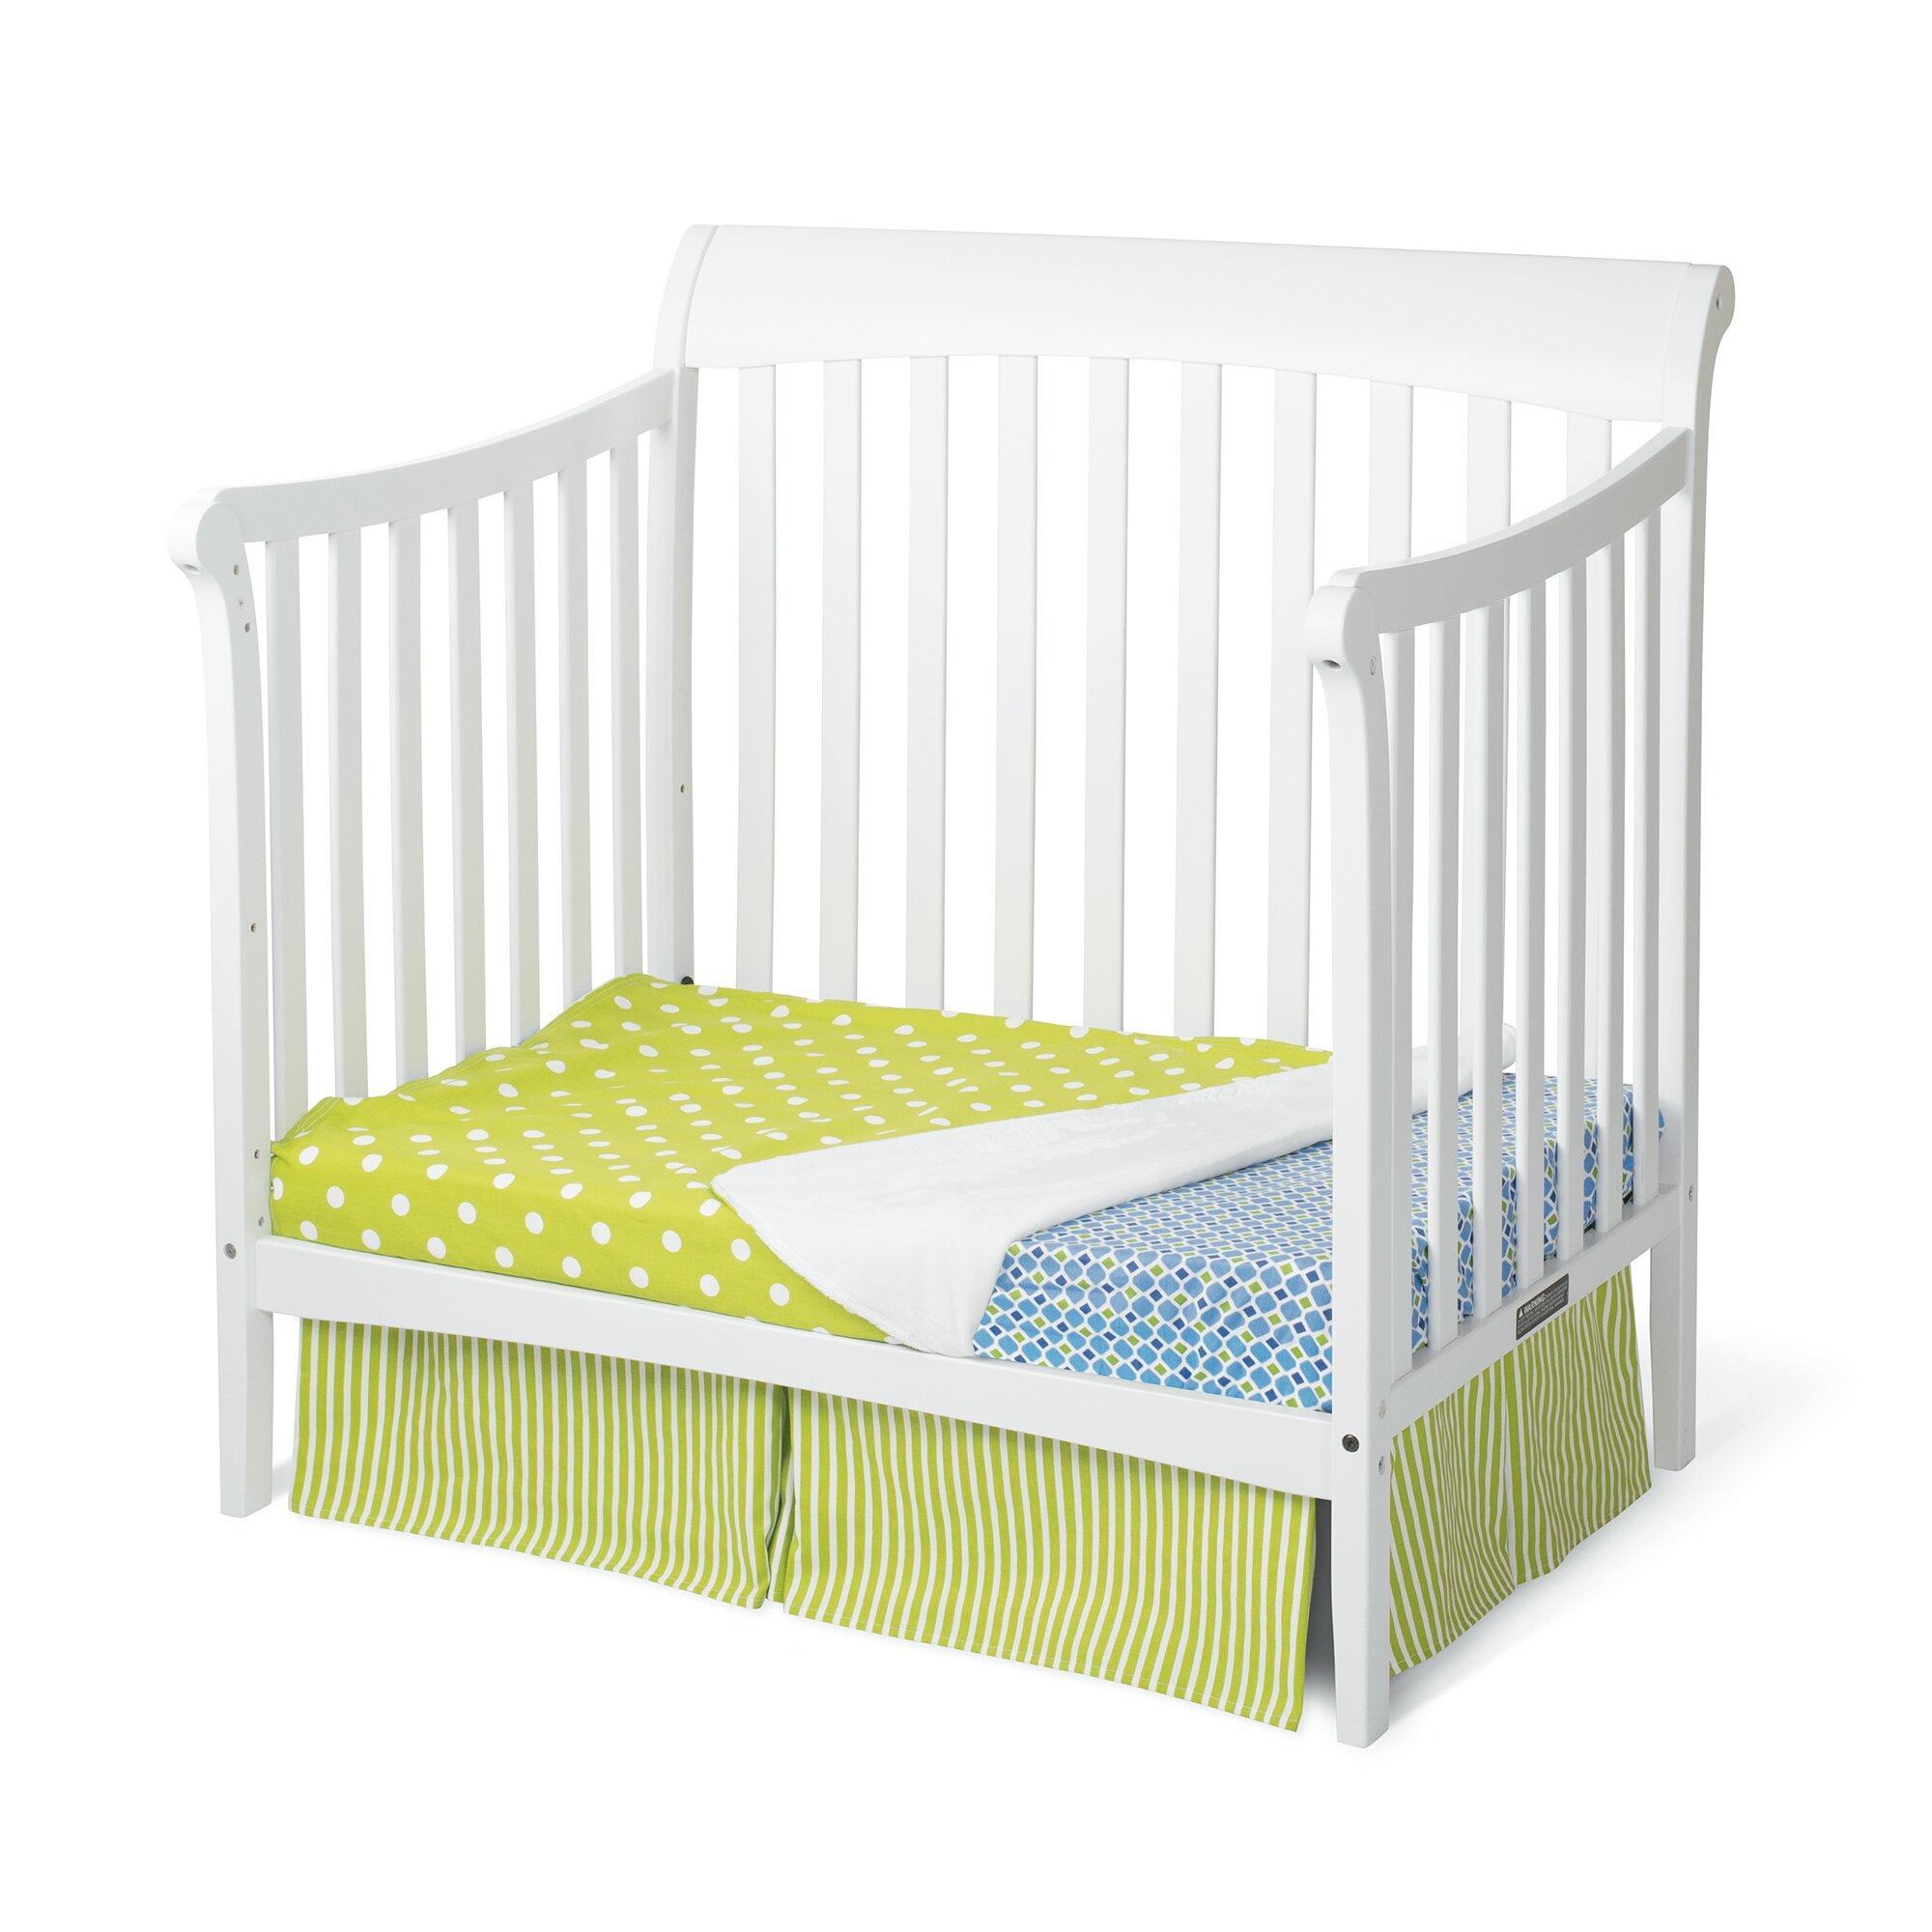 Mattress for baby crib - Child Craft Ashton 4 In 1 Convertible Mini Crib With Mattress